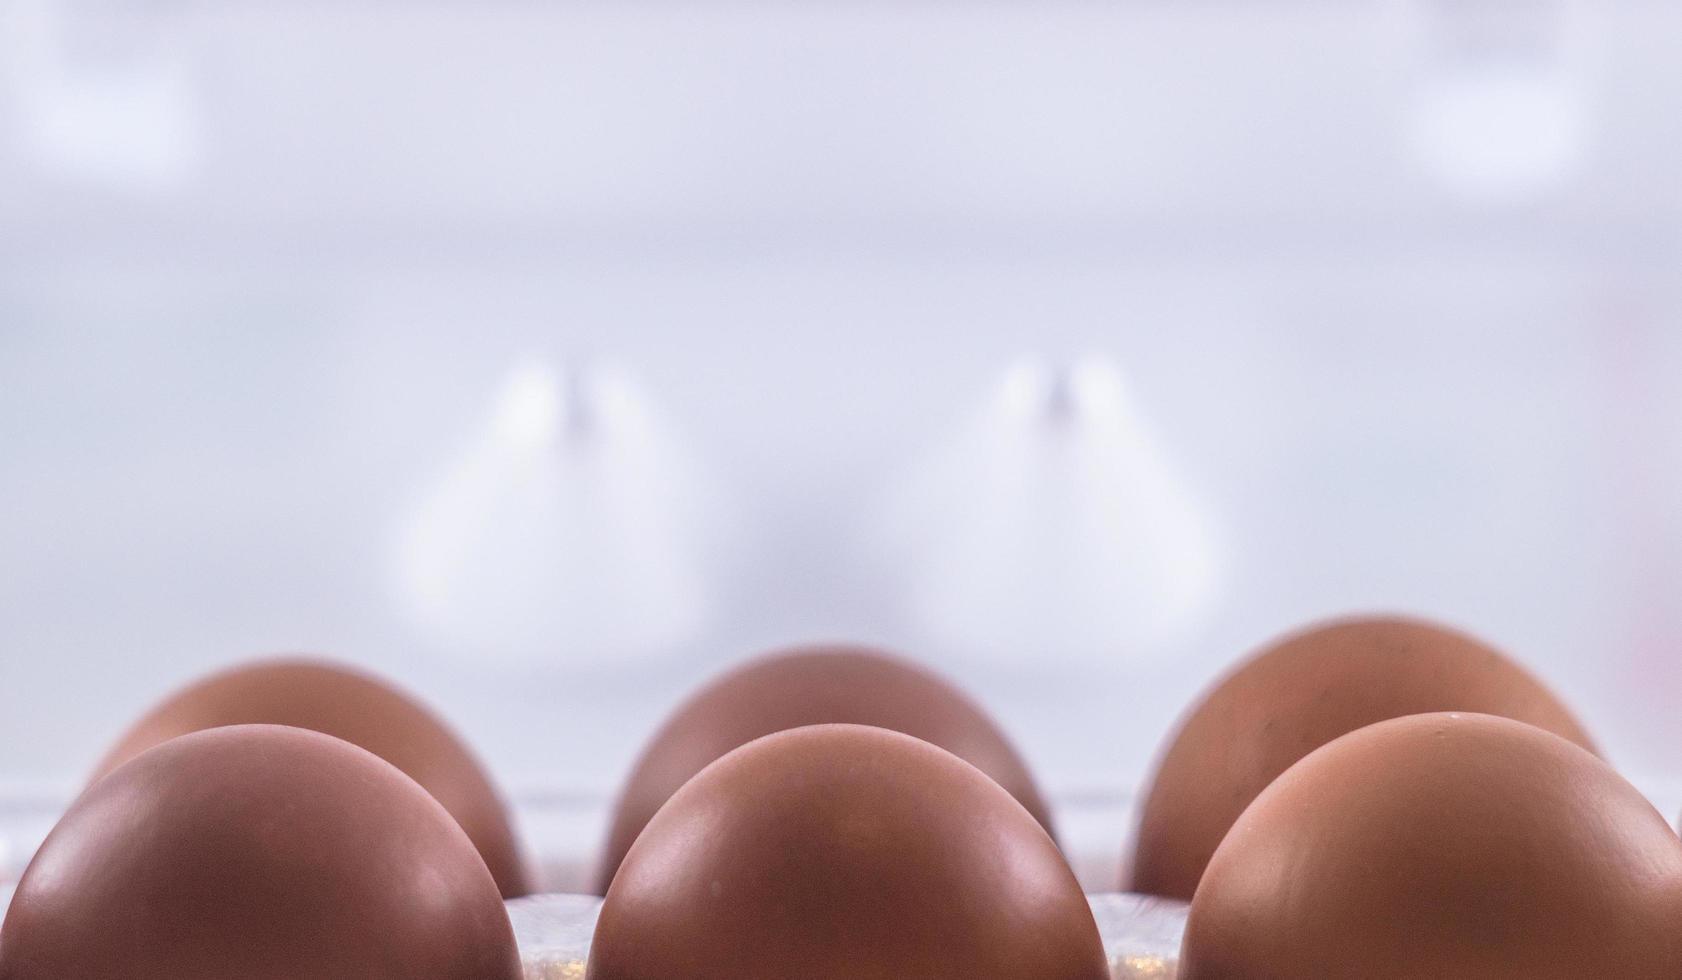 Nahaufnahme von sechs Eiern foto